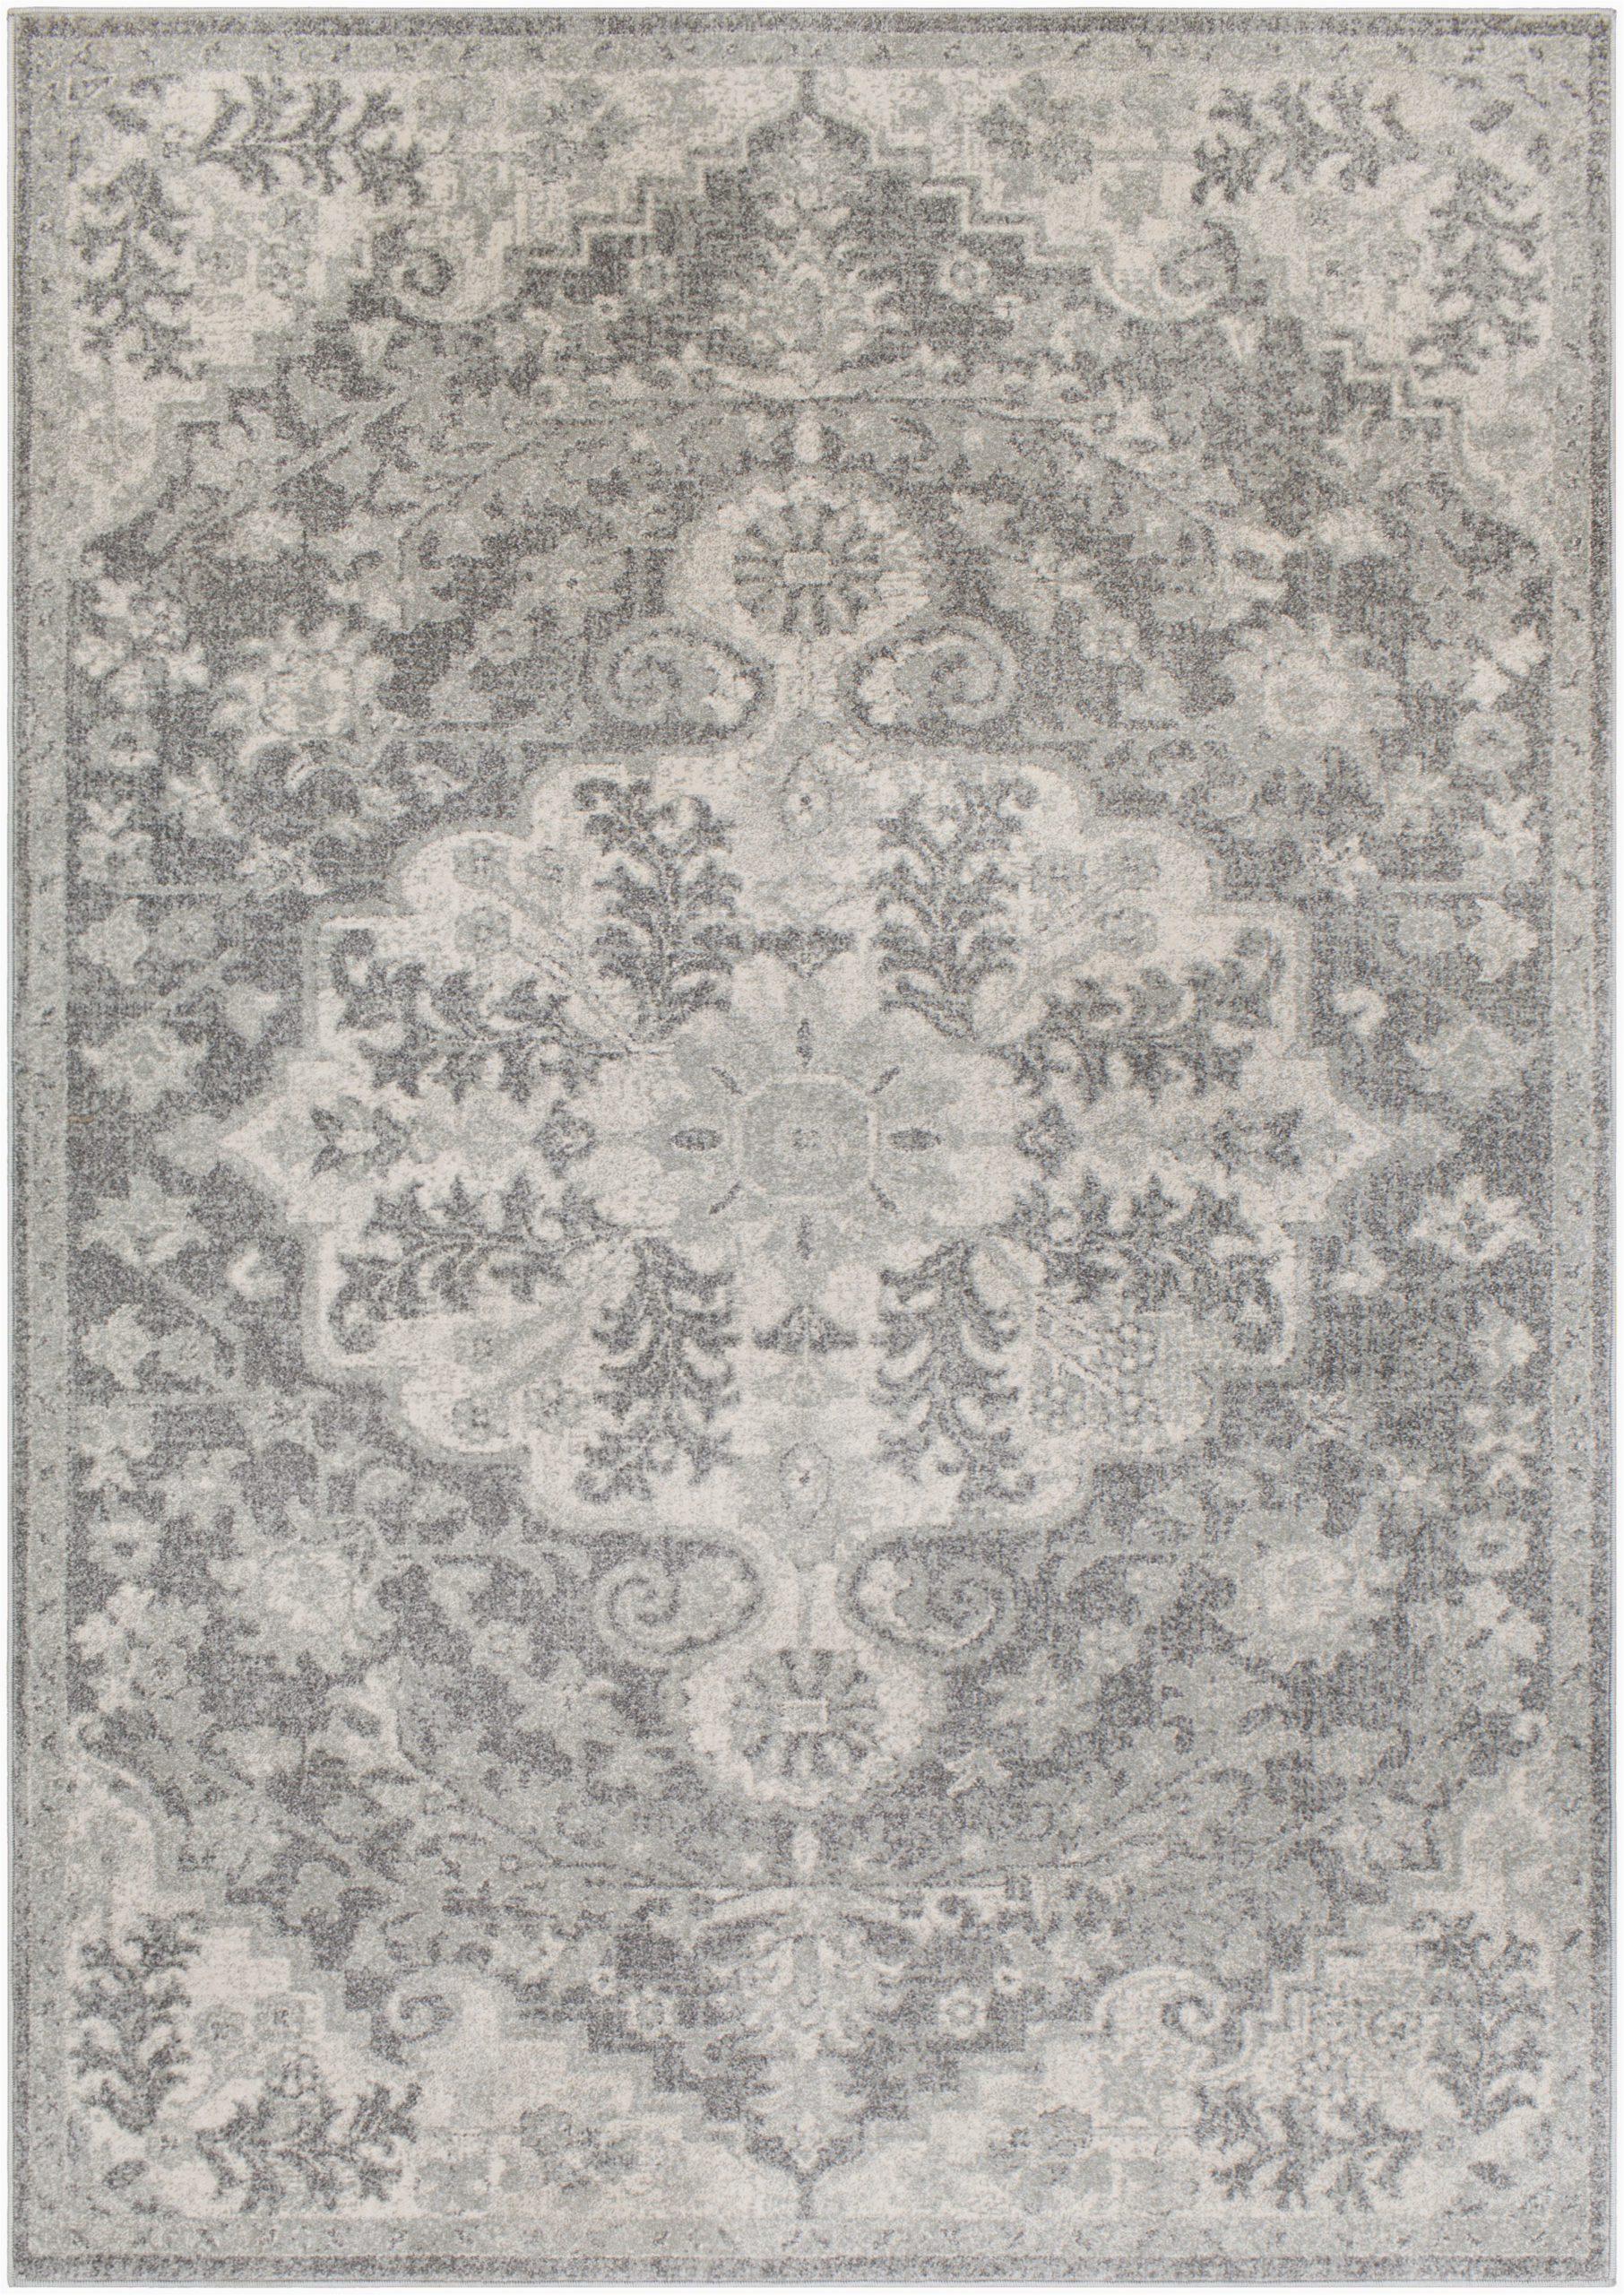 hillsby vintage beigecharcoal area rug mitn2360 piid=